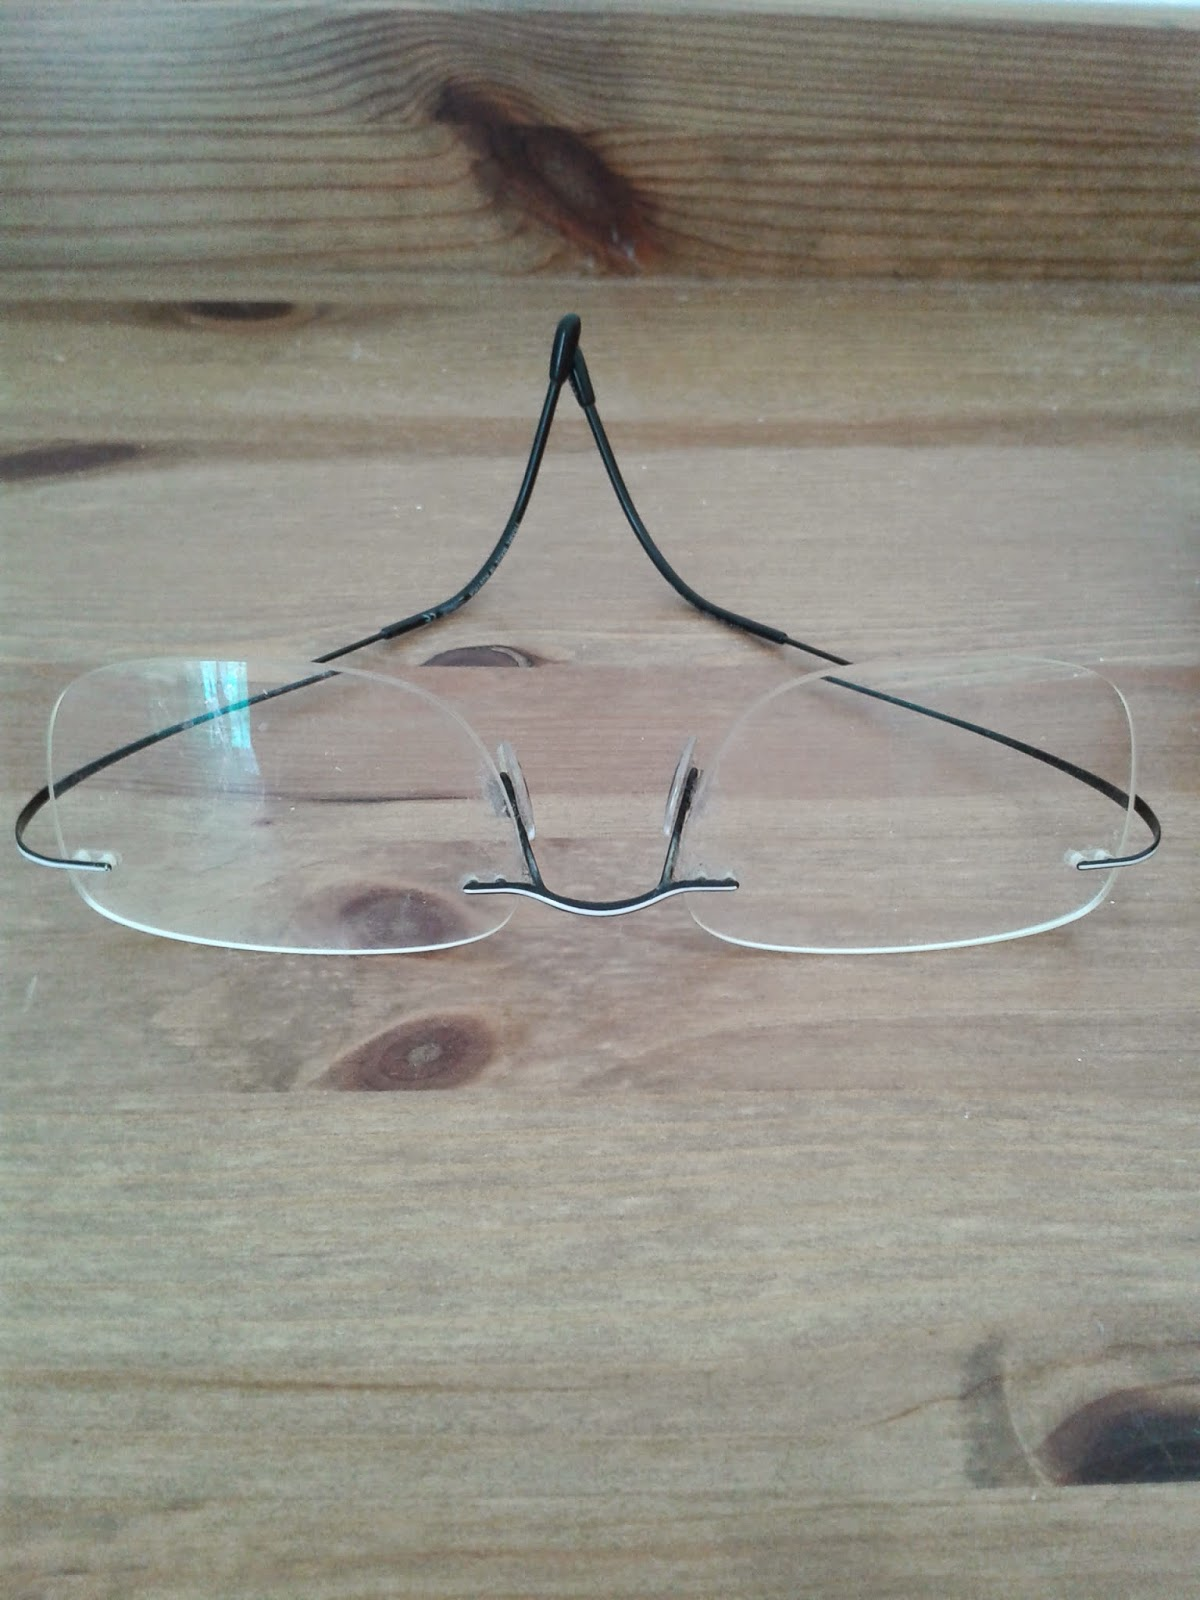 #mentalhealthawarenessweek #MHAW2017 Obsessive Compulsive Disorder - My Glasses